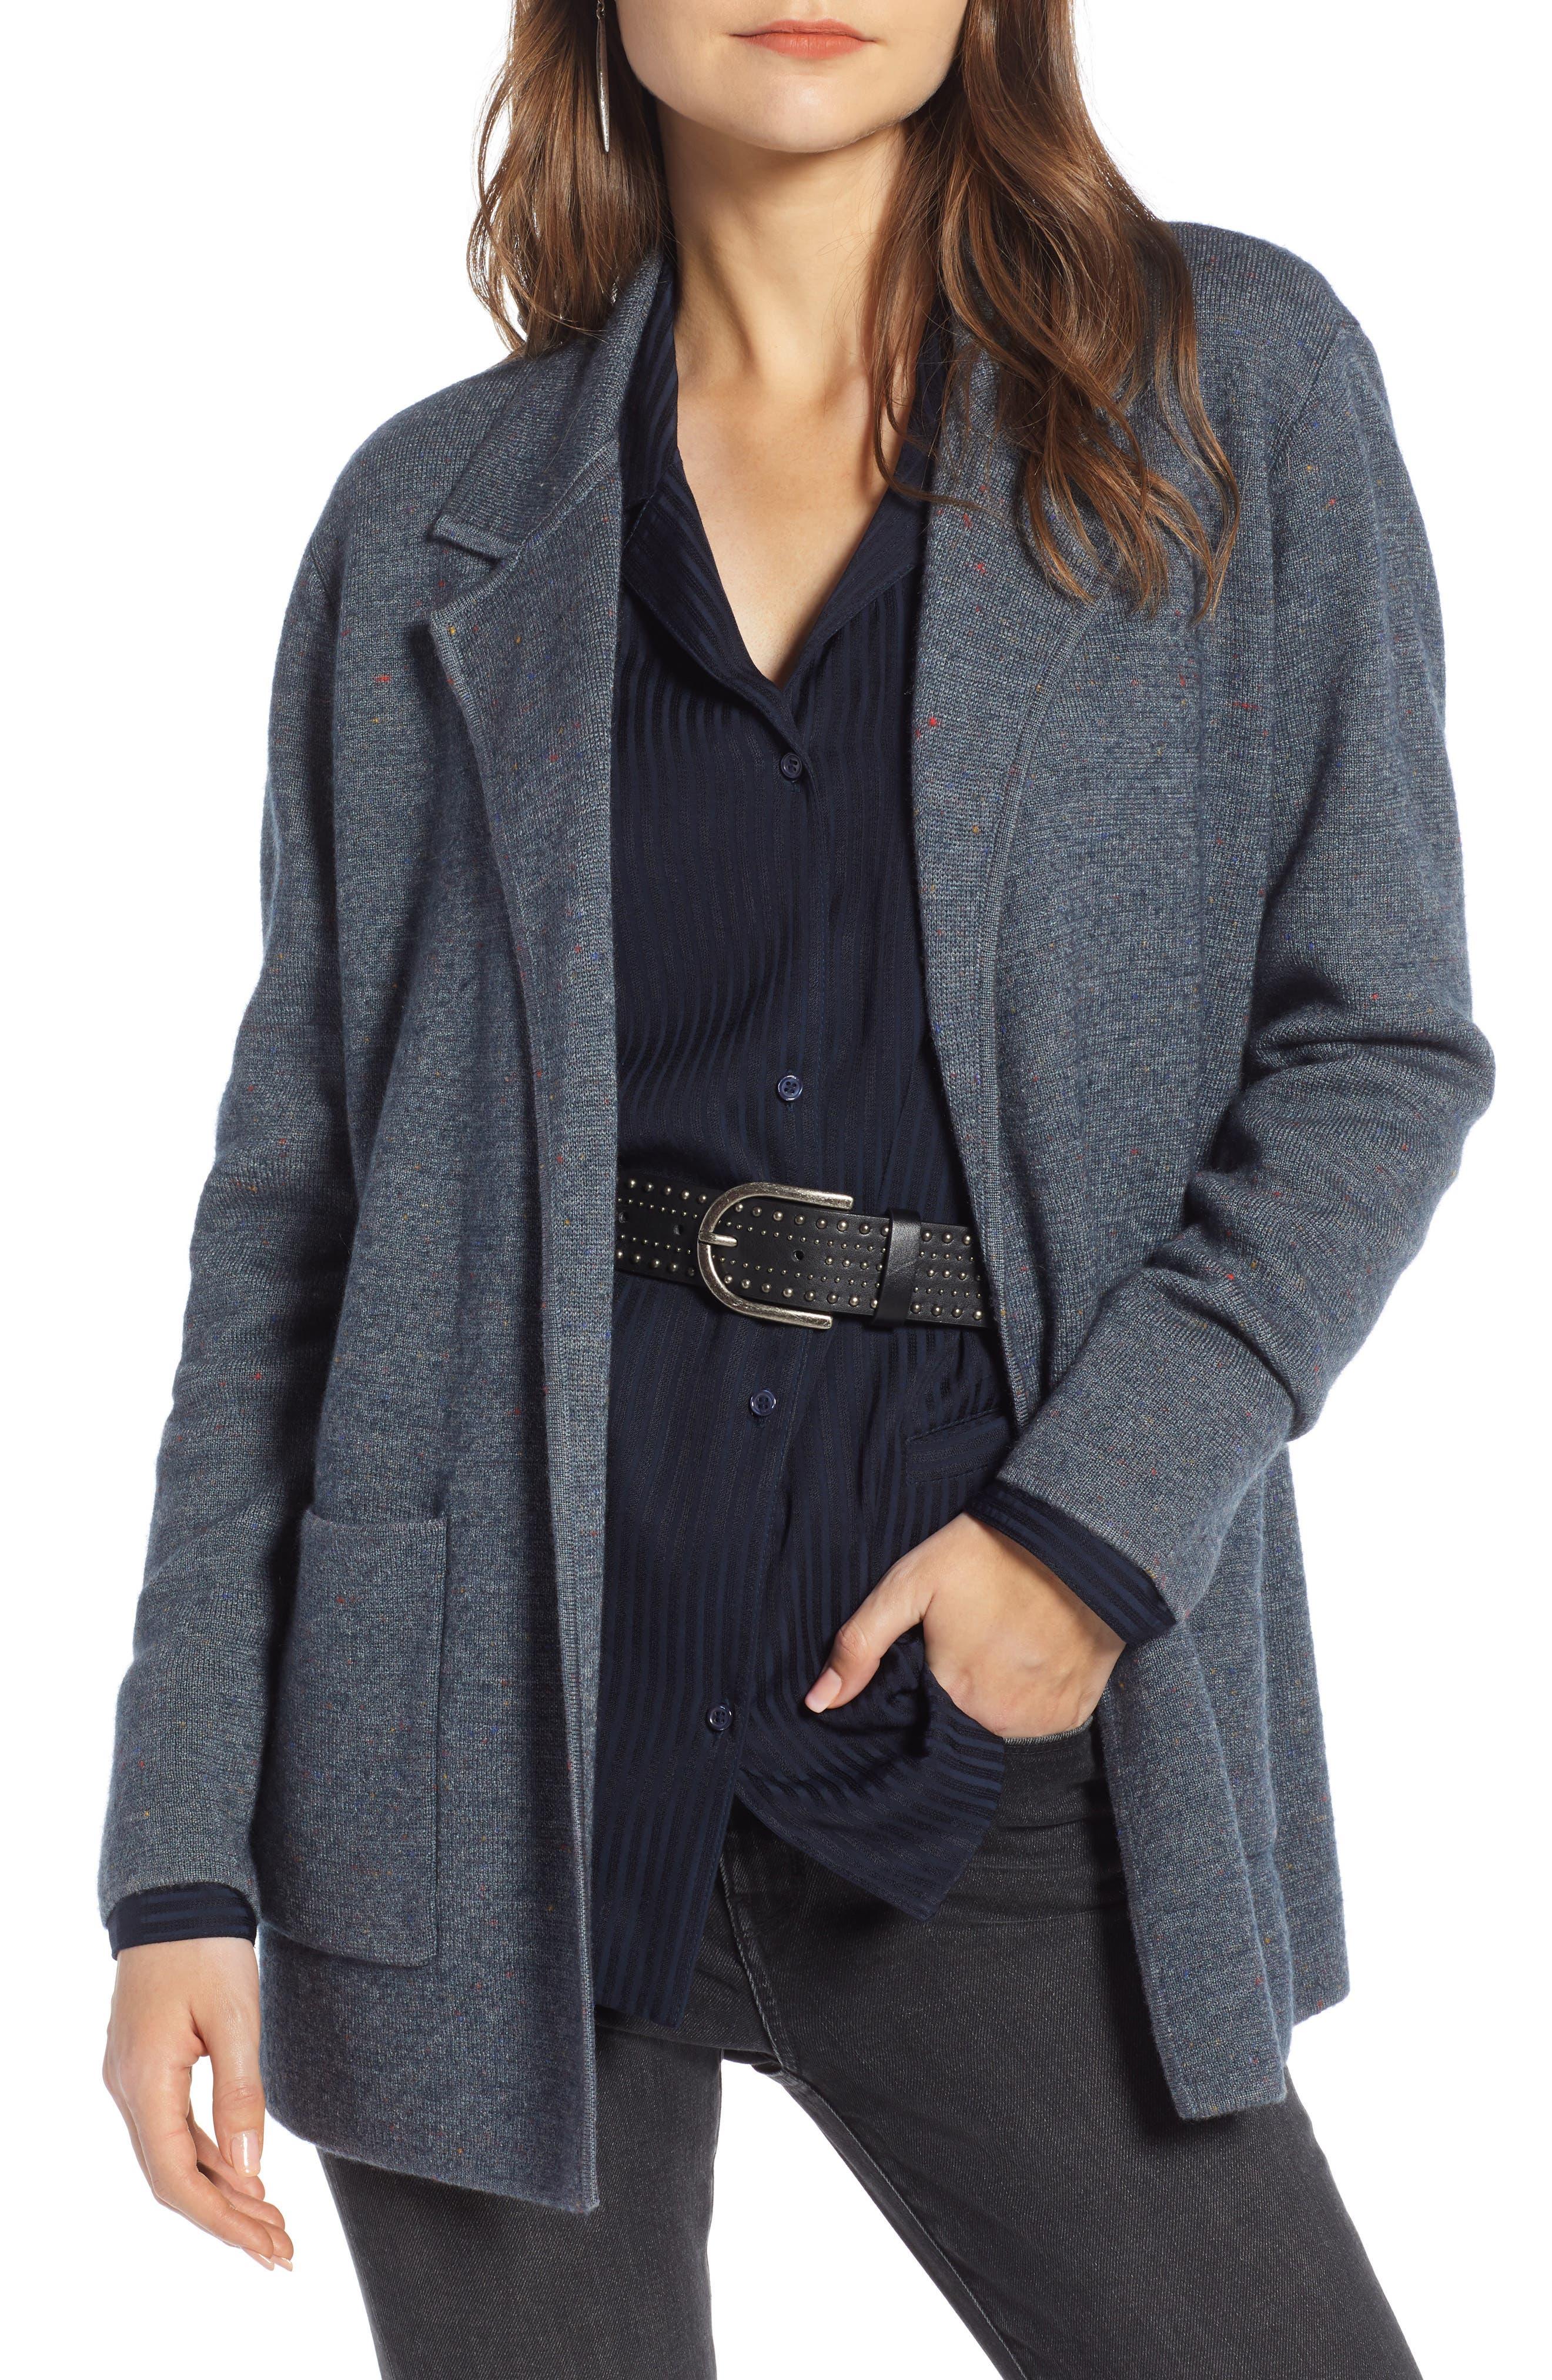 Sweater Blazer, Main, color, GREY MEDIUM CHARCOAL HEATHER